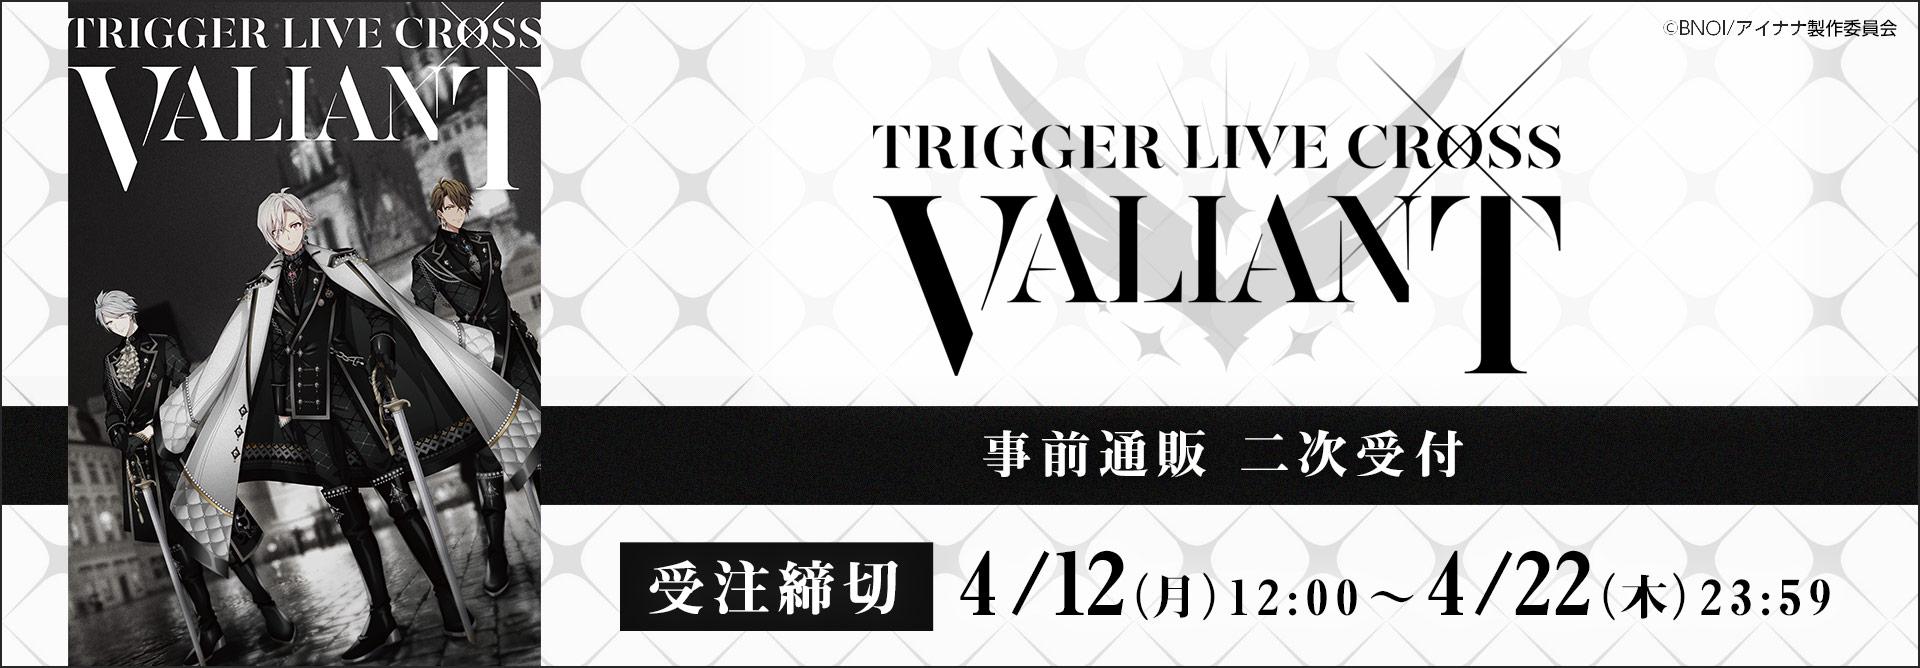 TRIGGER LIVE CROSS VALIANT 事前通販 二次受付